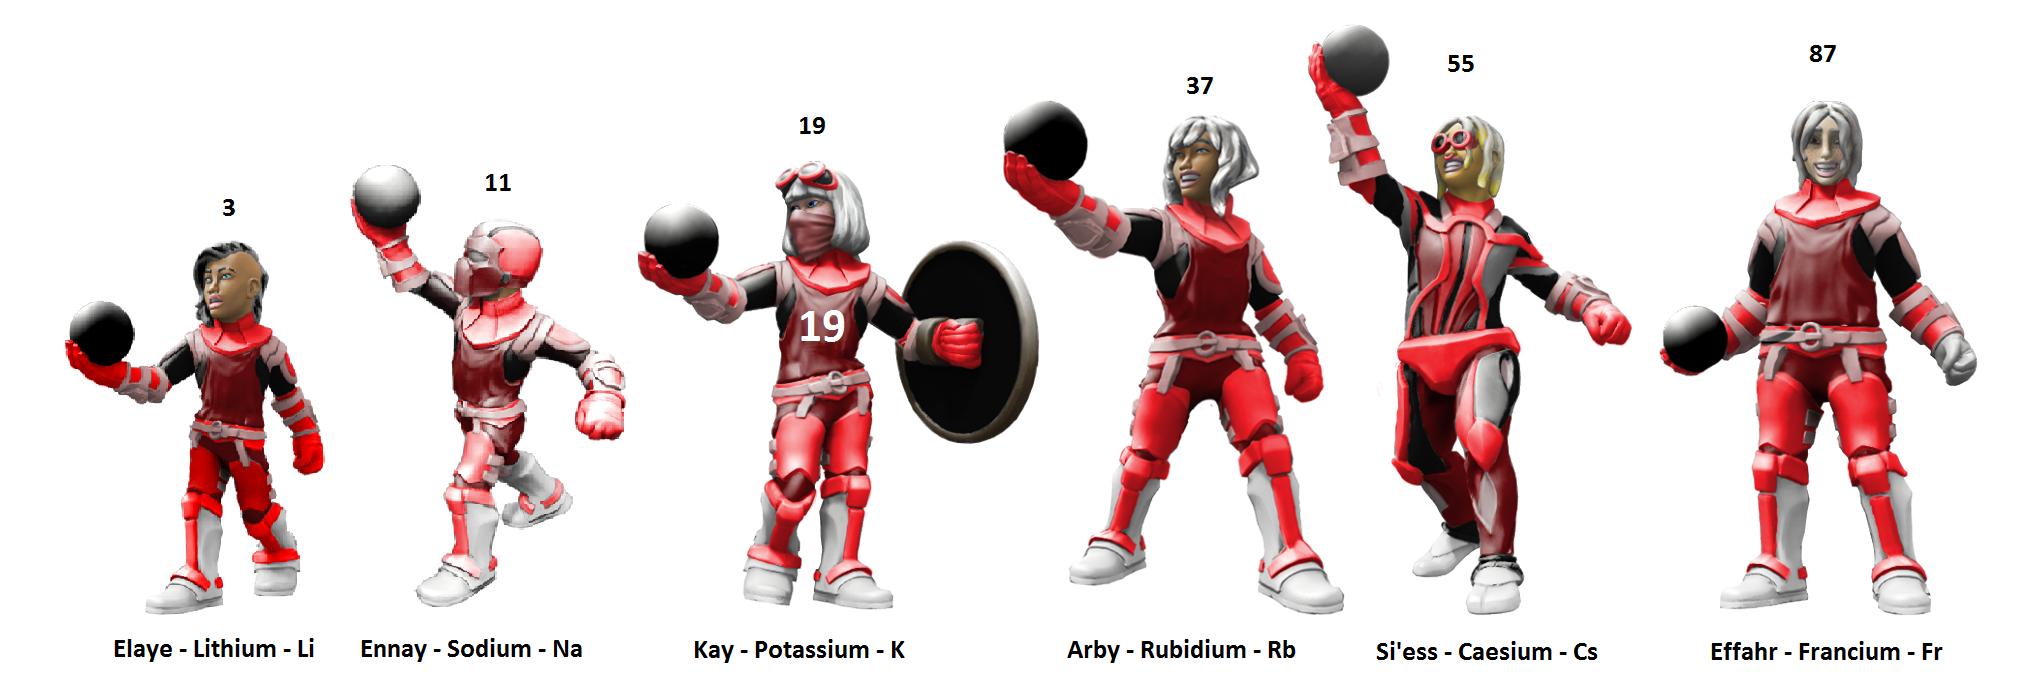 the alkais red uniforms